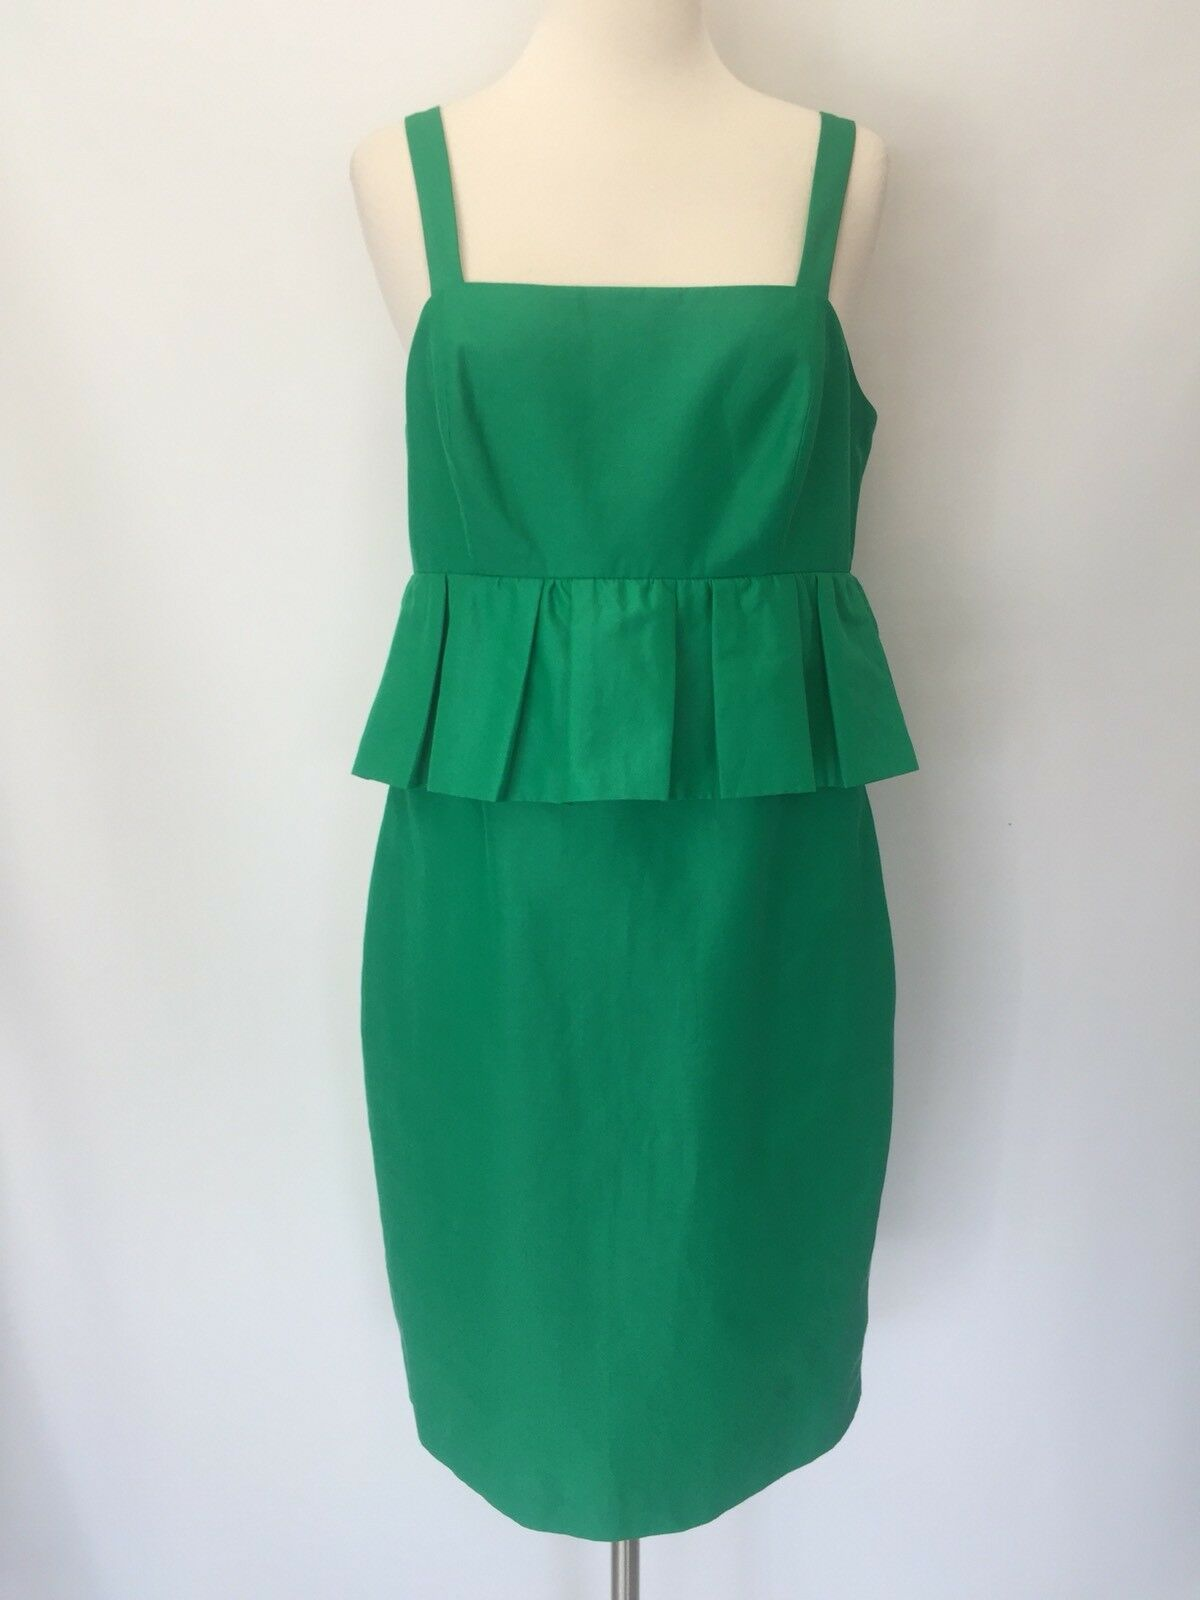 New J Crew Peplum Dress In Classic Failed Sz 8 Green G6482